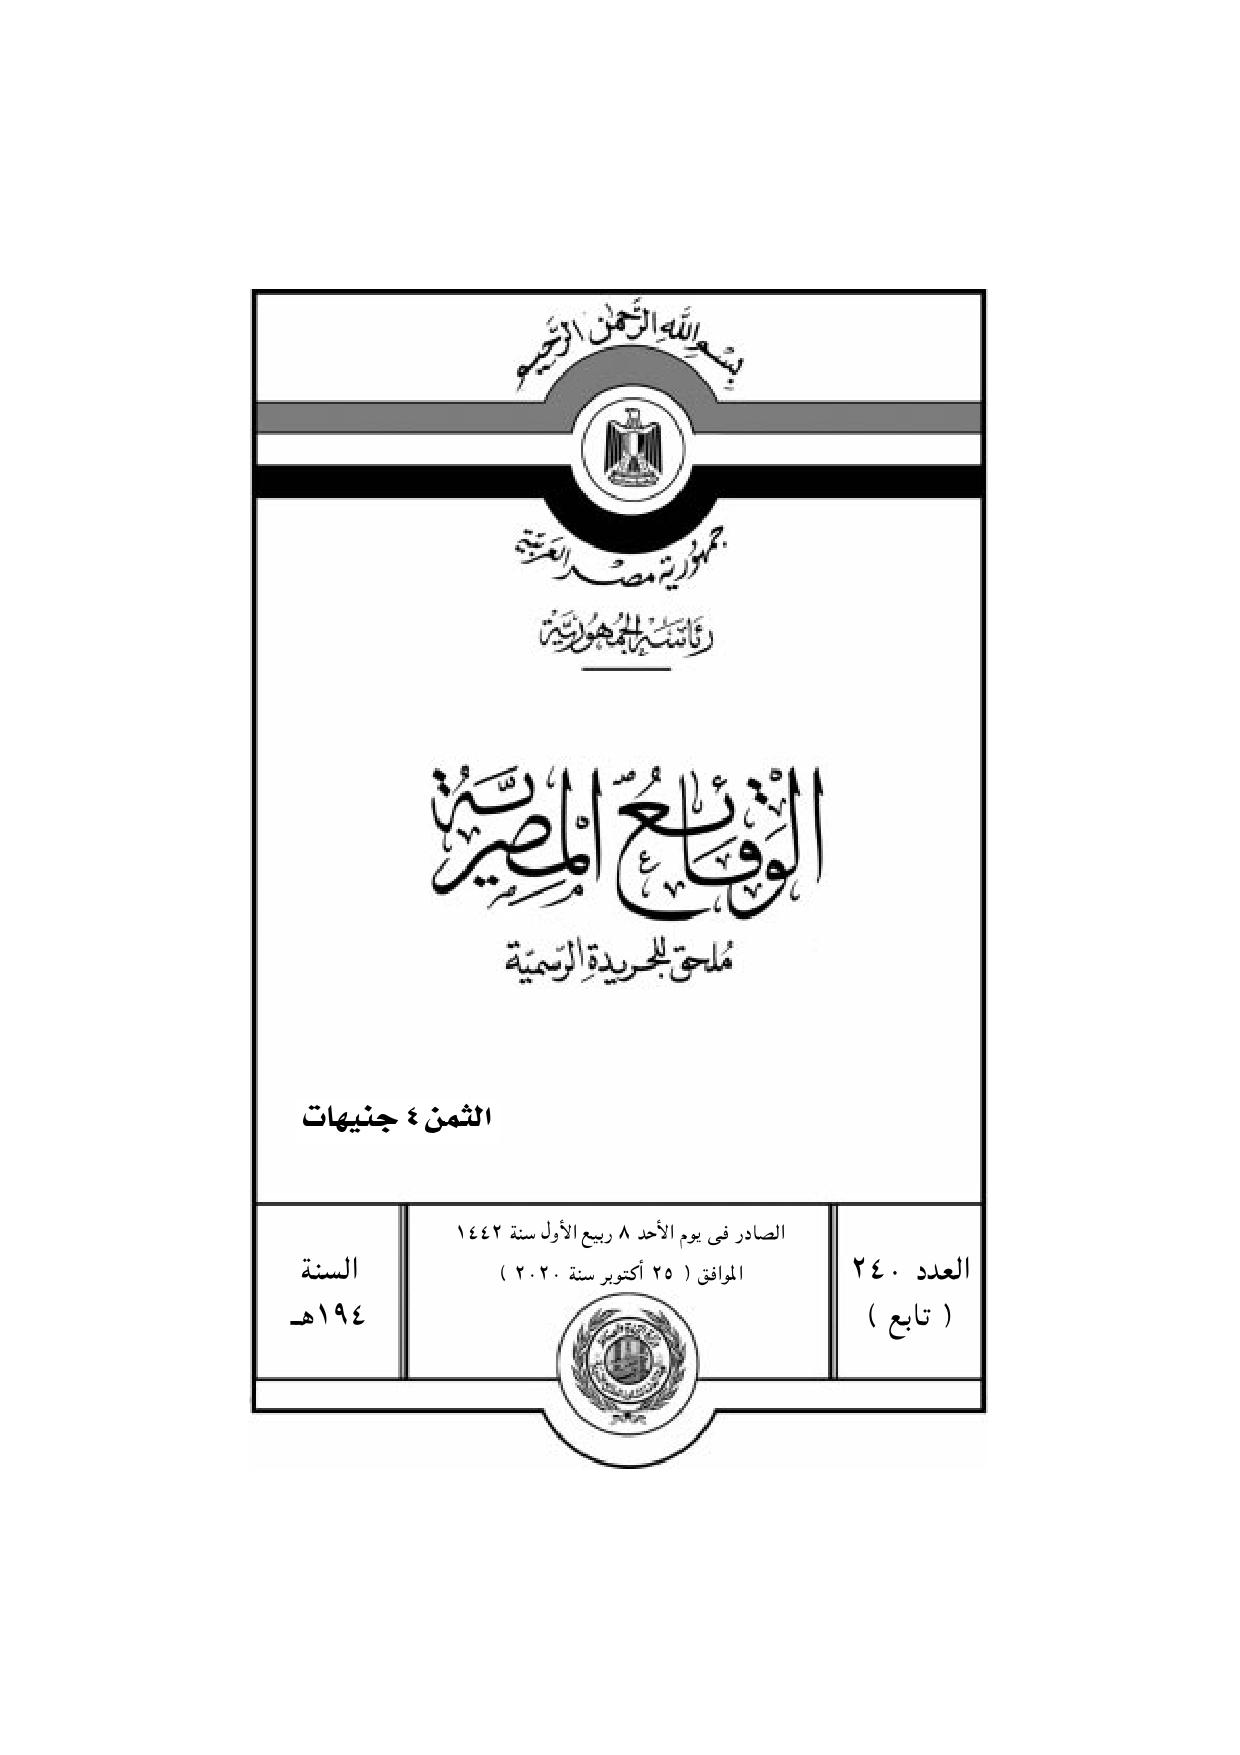 240 تابع مؤمن_page-0001